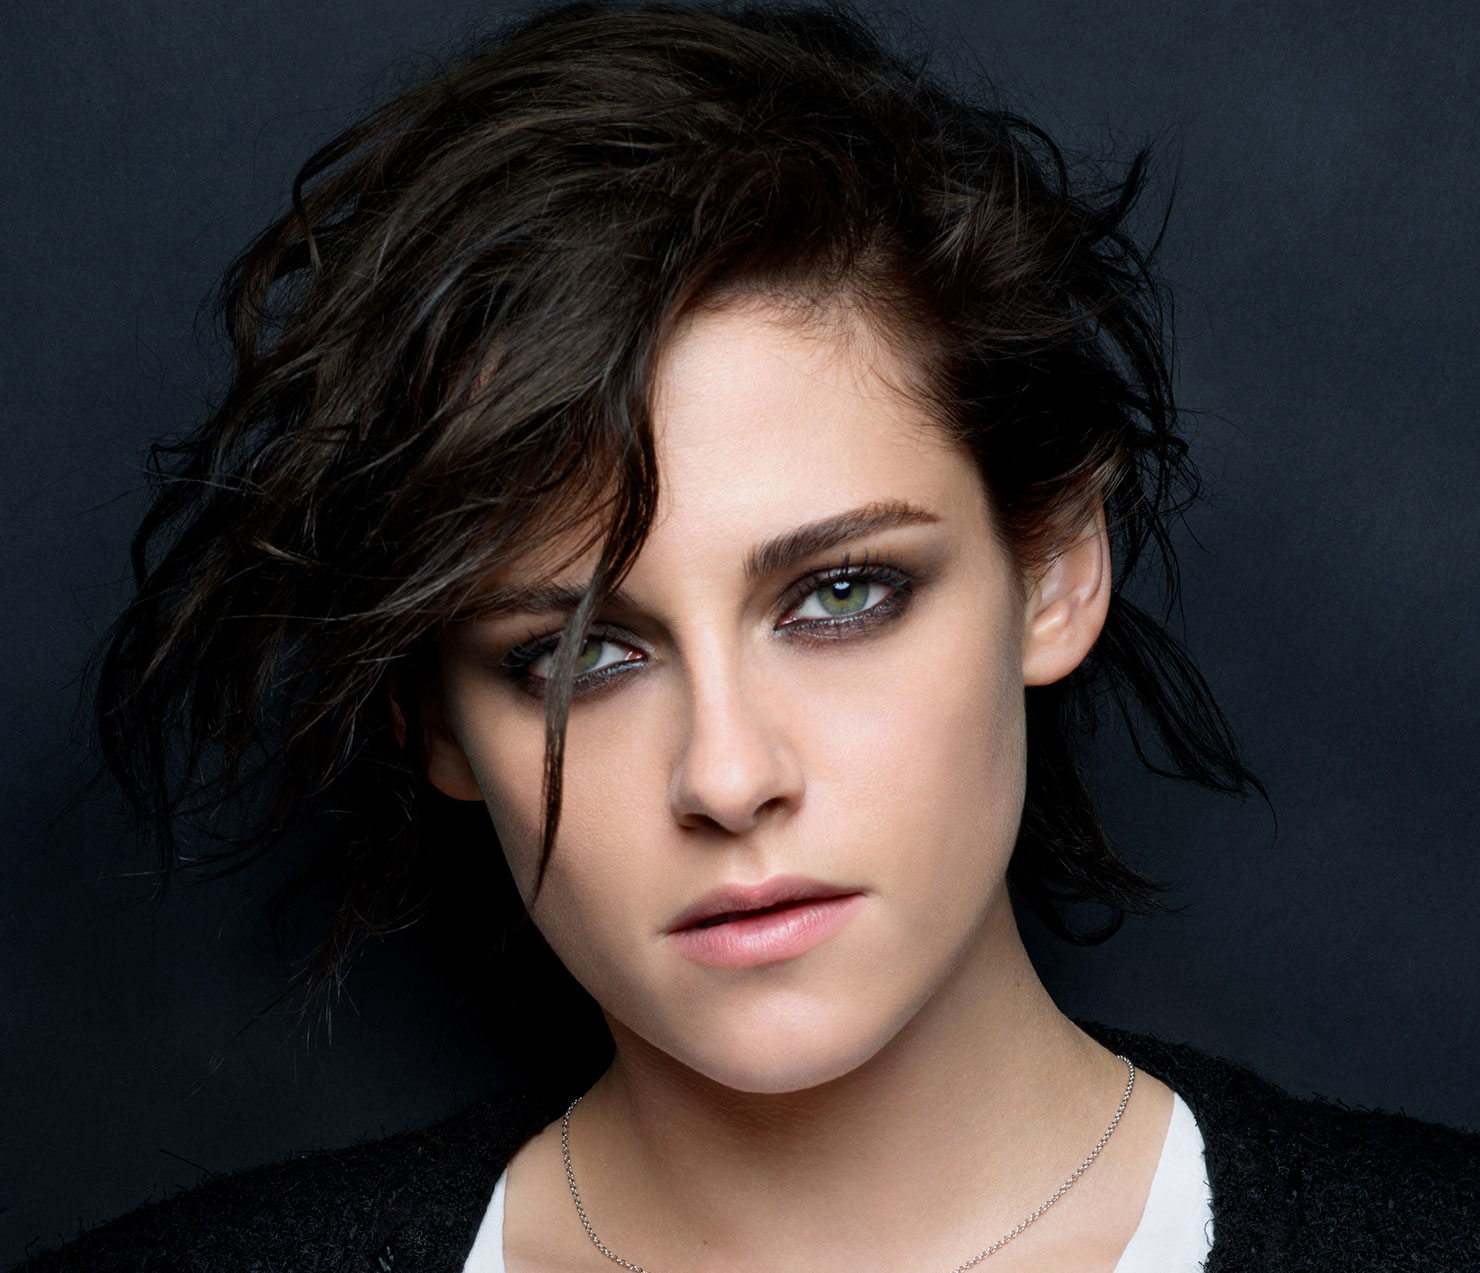 Kristen Stewart é o rosto da campanha do novo perfume da Chanel